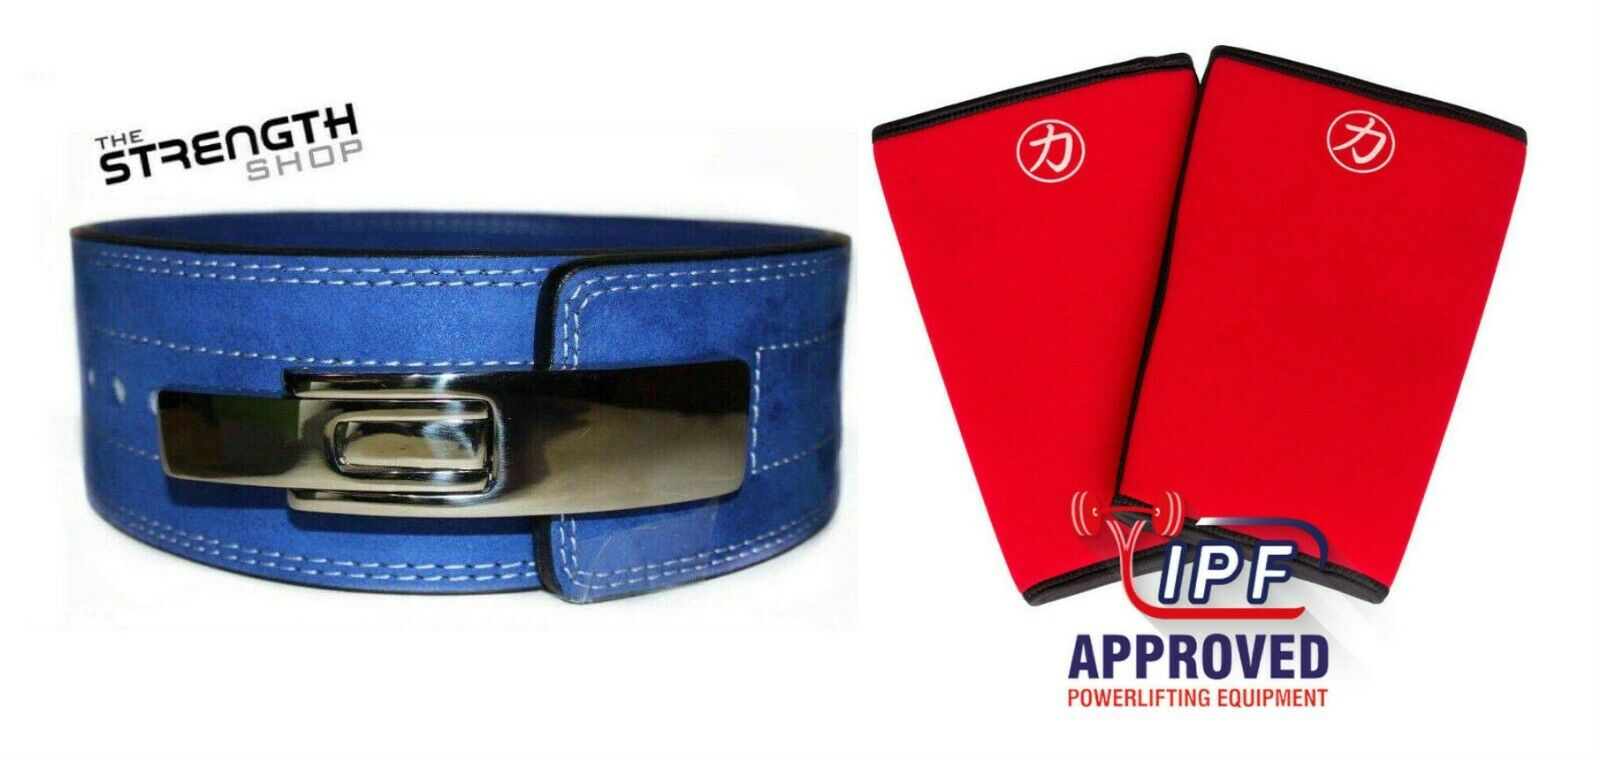 Strength Shop 10MM bleu POWERLIFTING LEVER BELT (grand) + INFERNO Knee Sleeves